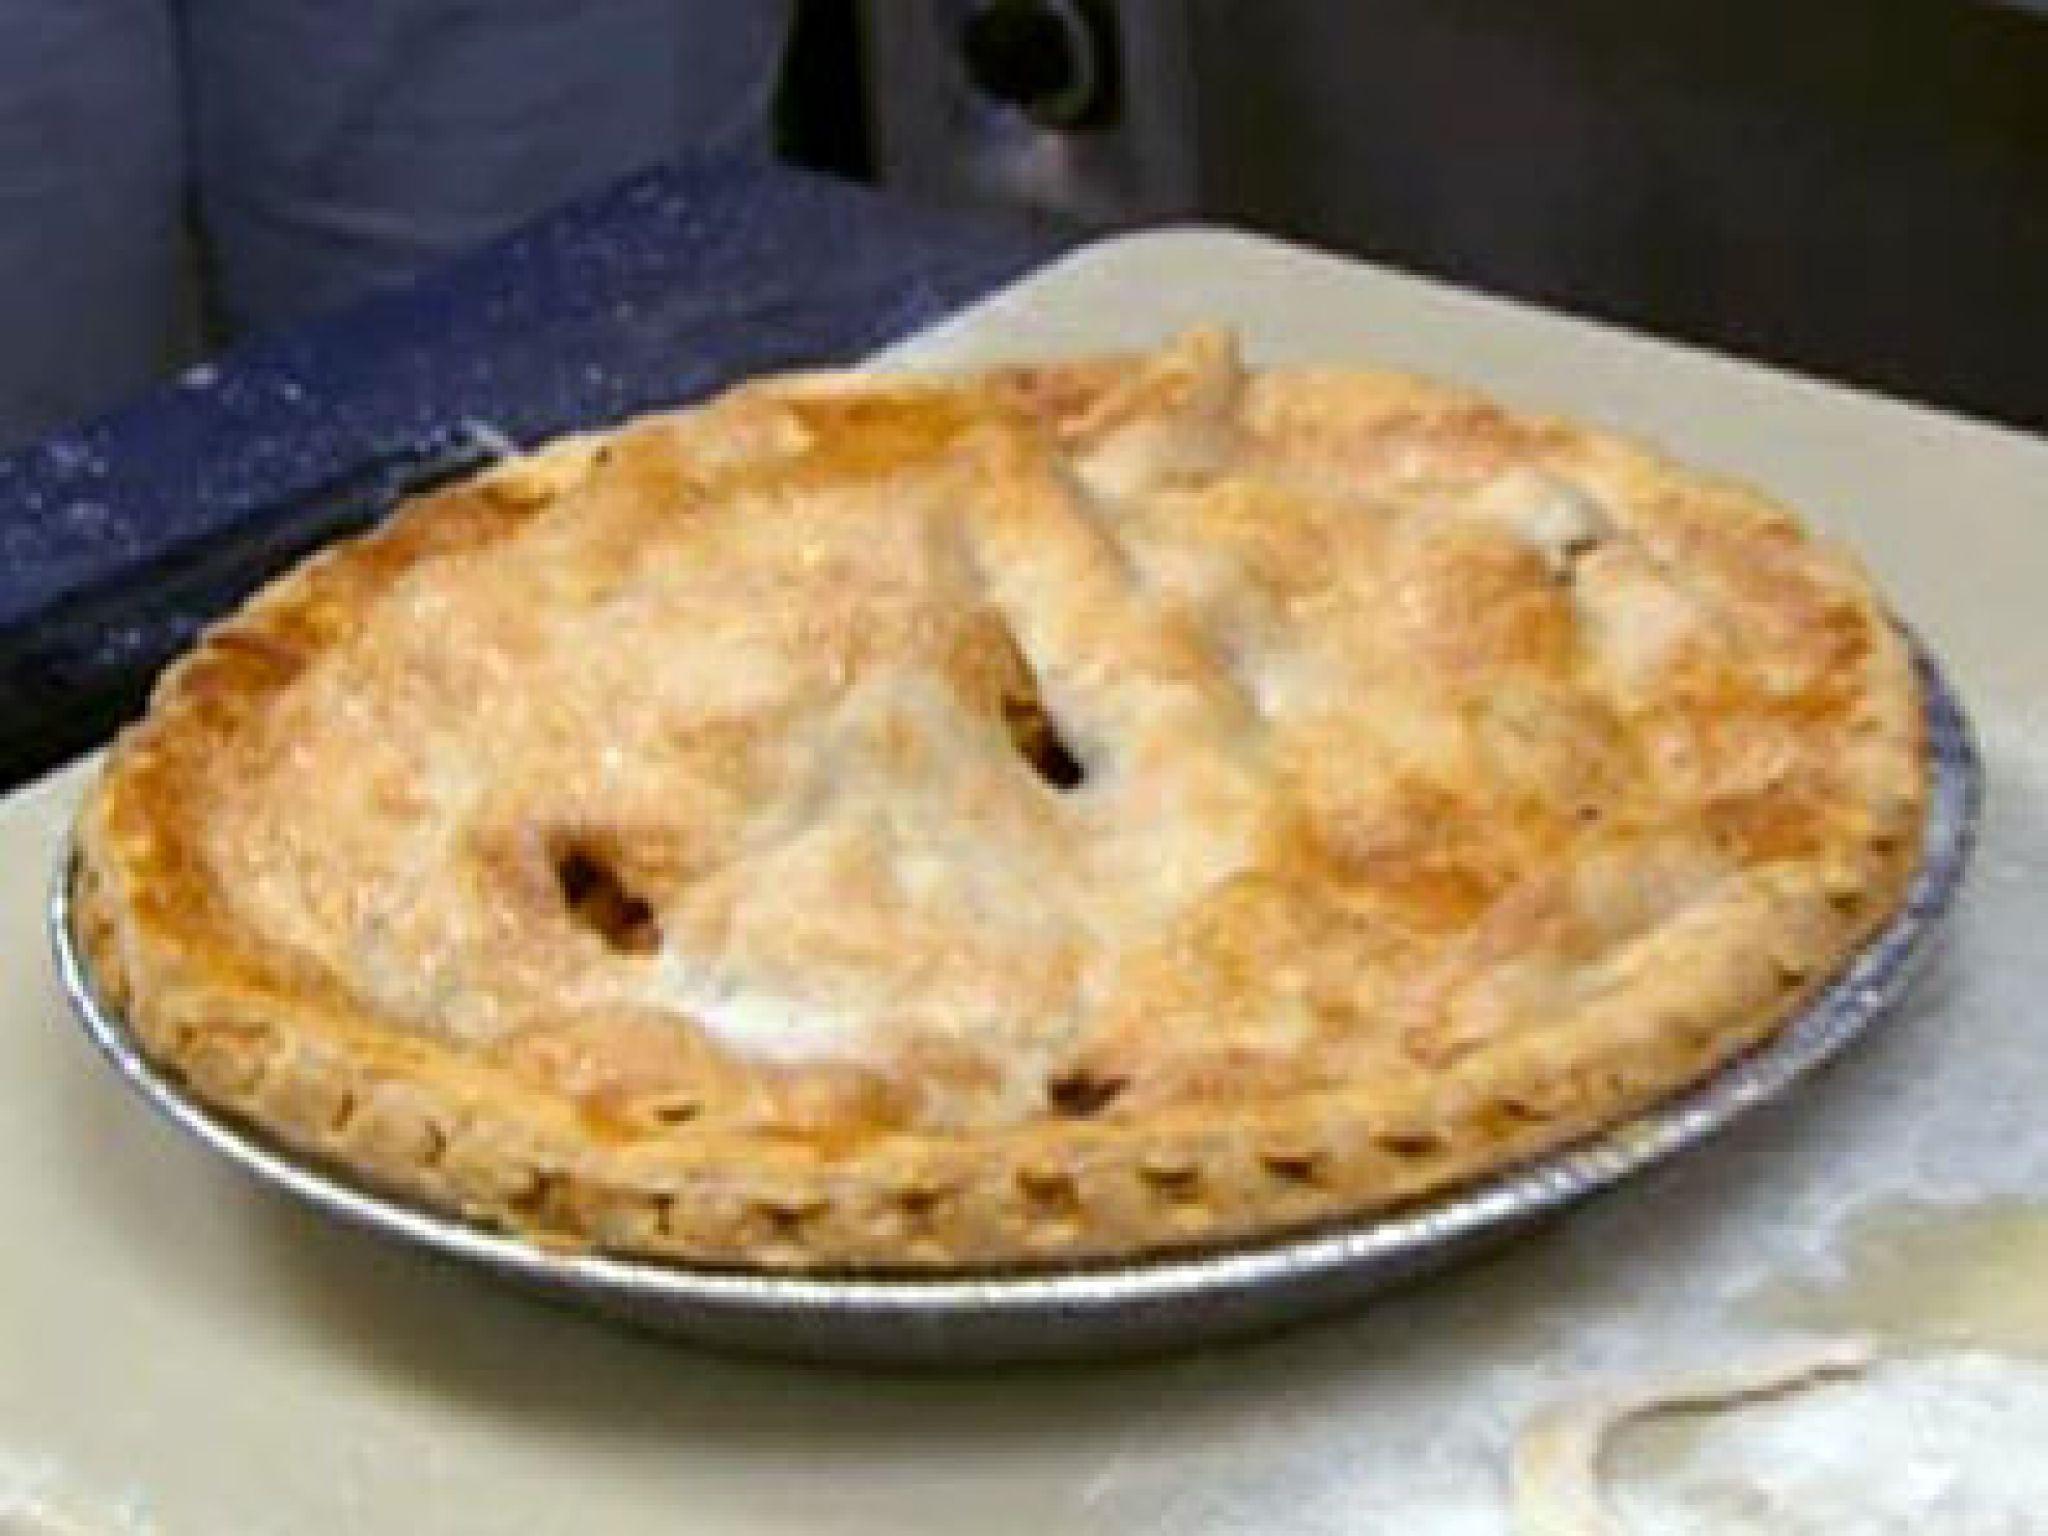 Apple pie recipe robert irvine apple pie recipes and apple pies apple pie forumfinder Choice Image